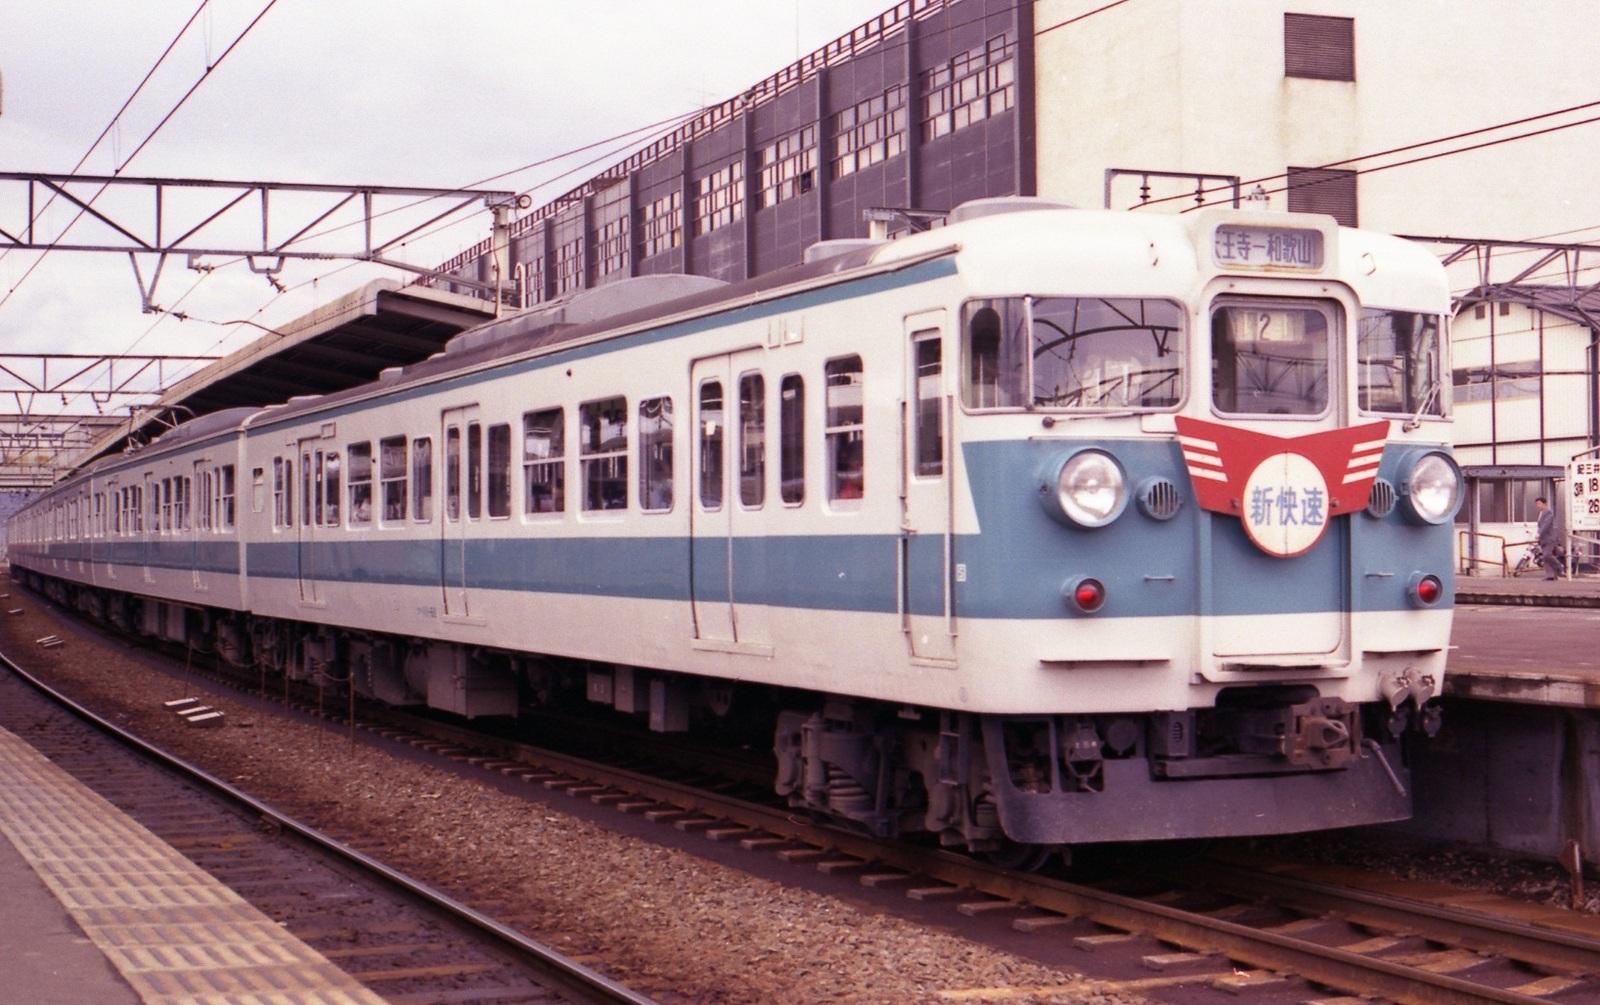 19760327a01